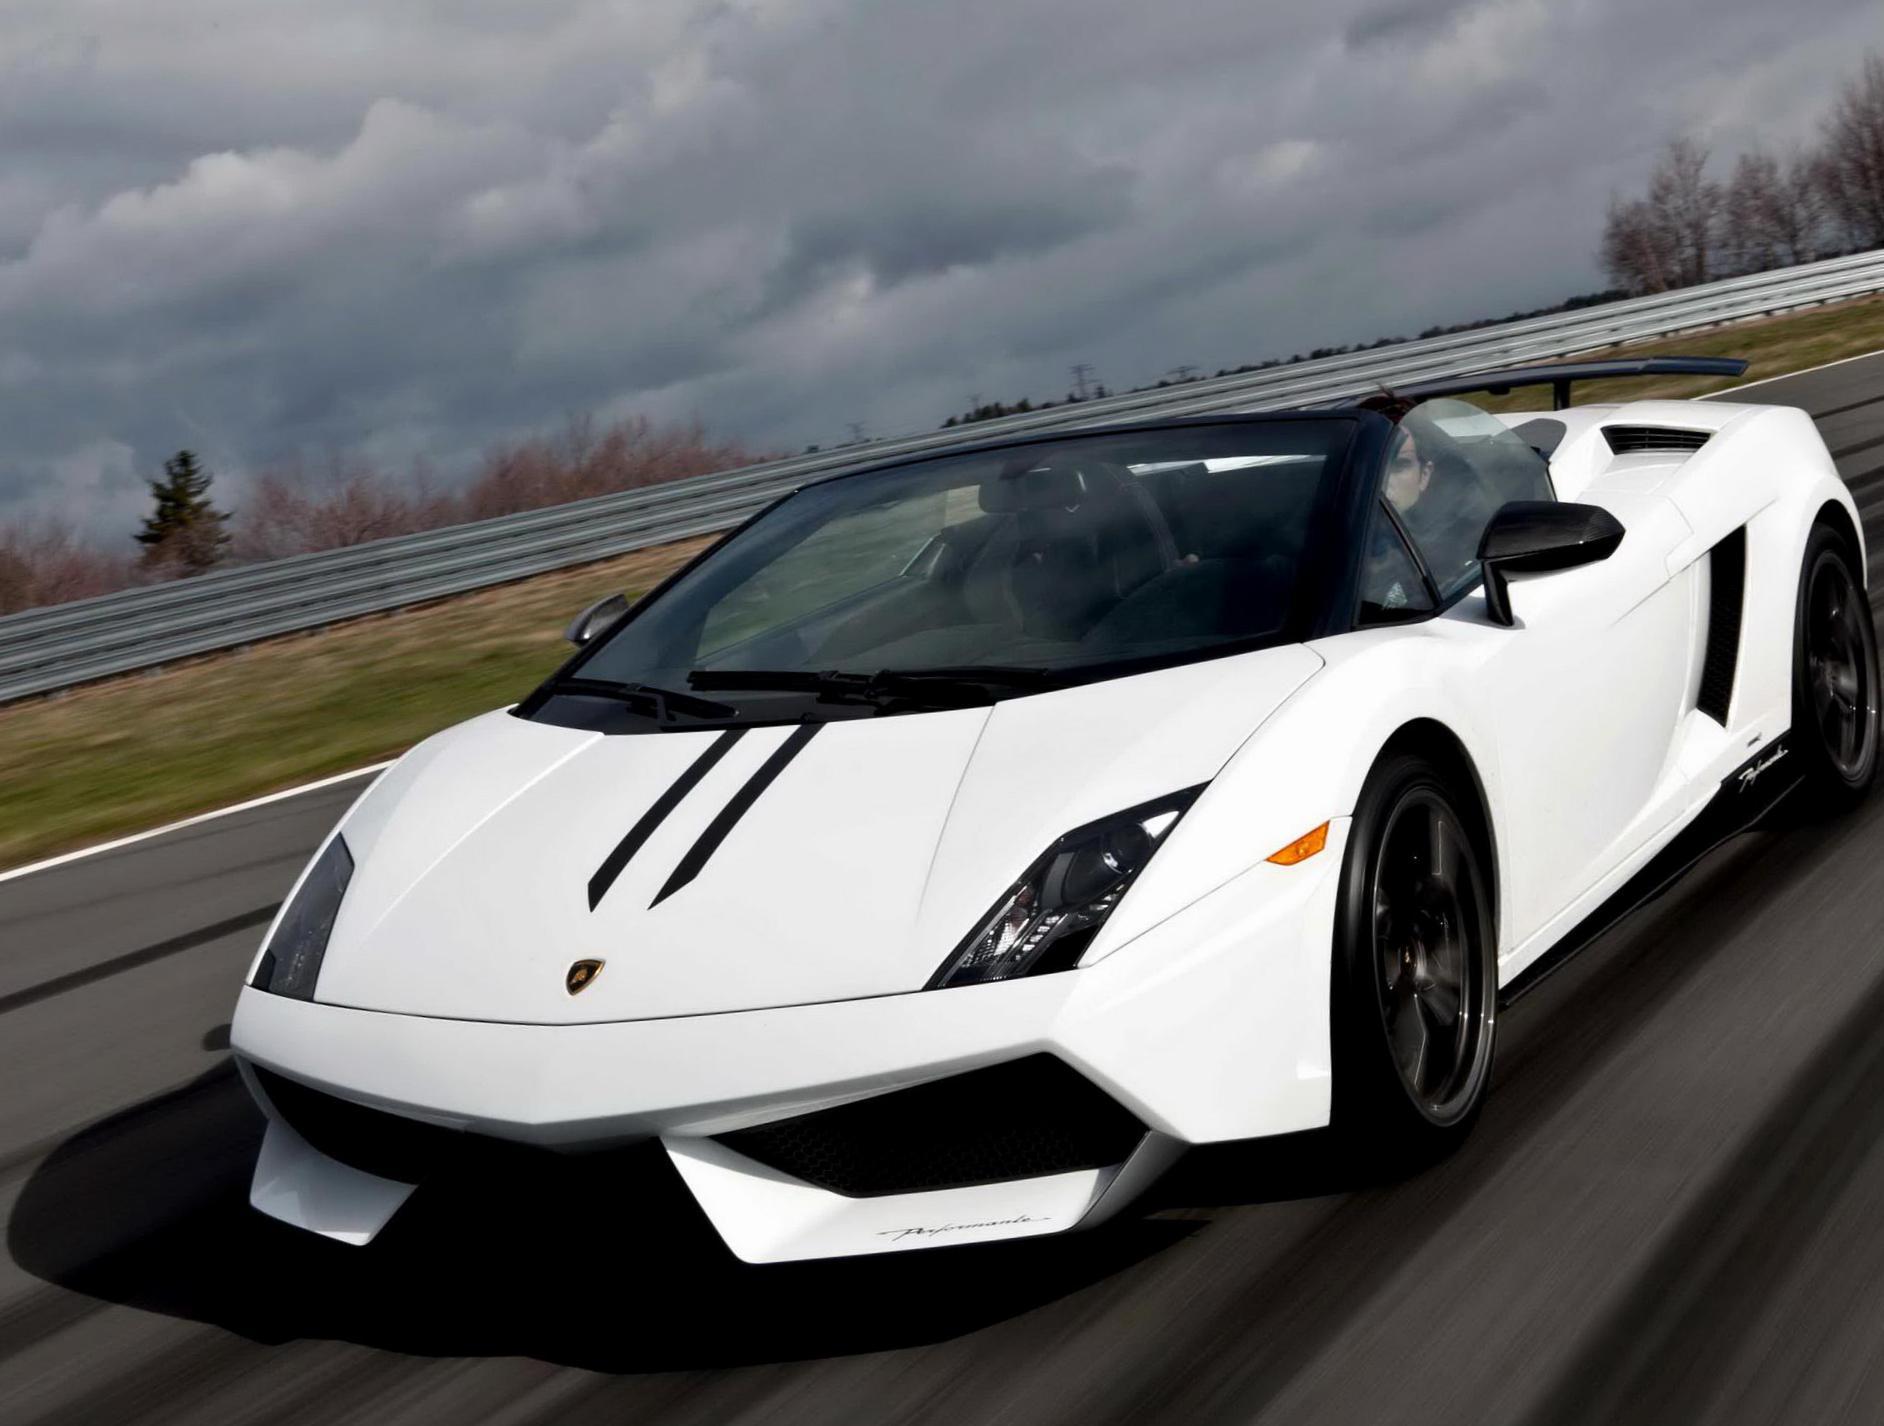 Lamborghini Gallardo Lp 570 4 Spyder Performante Photos And Specs